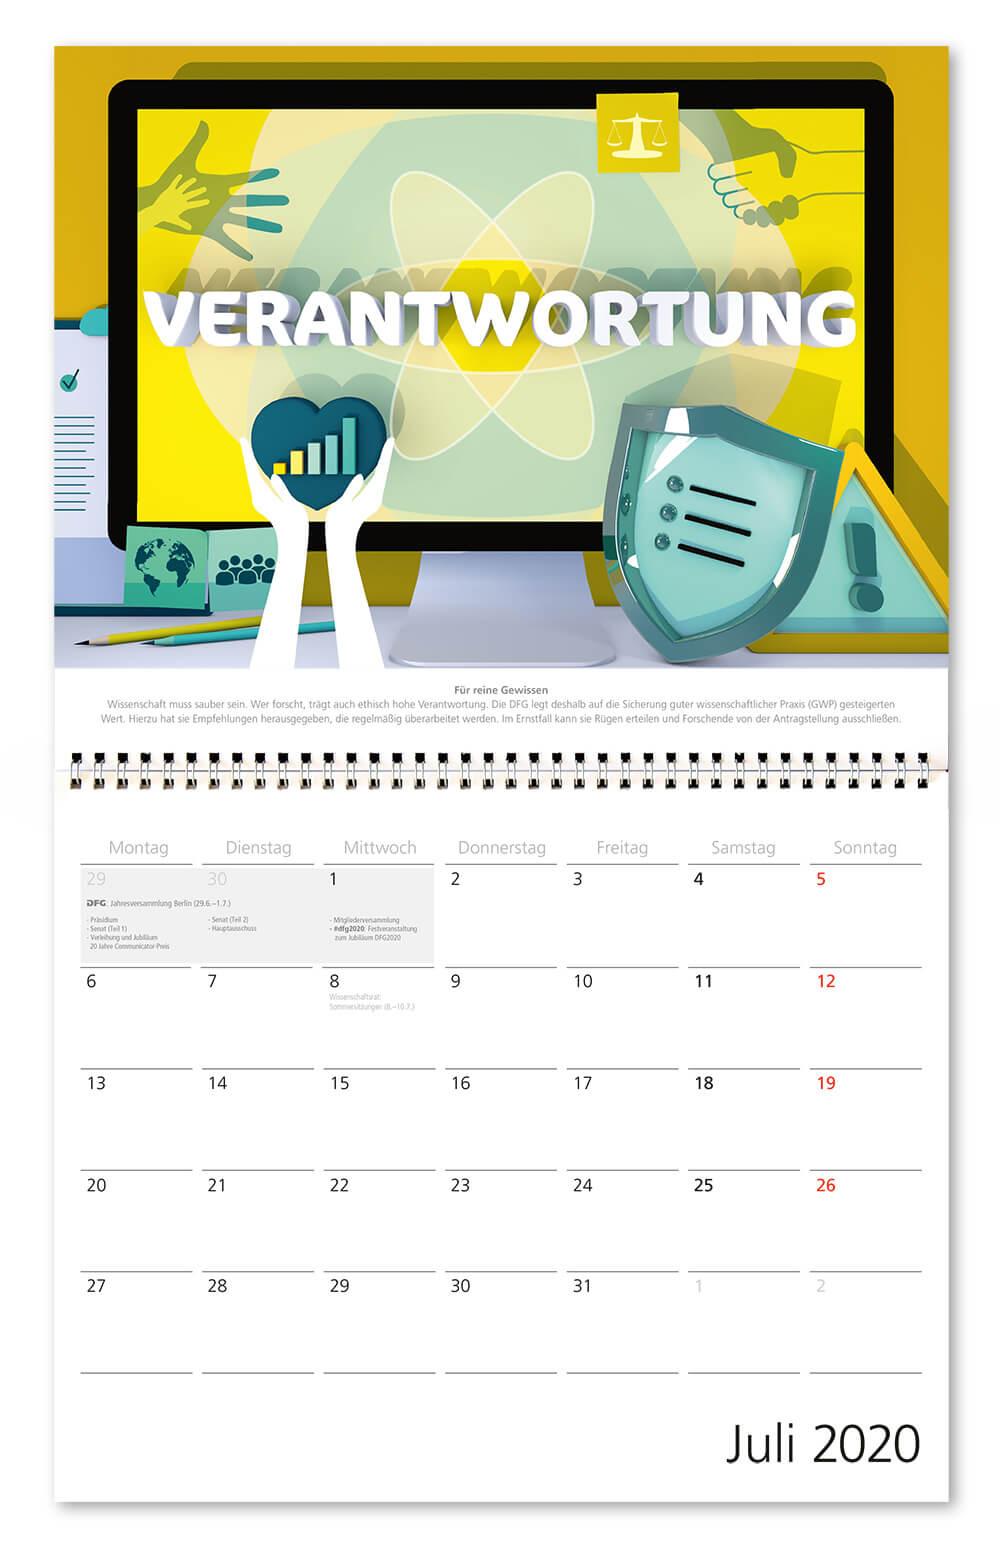 100 Jahre Deutsche Forschungsgemeinschaft / DFG / Wandkalender 2020 / Juli: Verantwortung / Design: Daniela Leitner